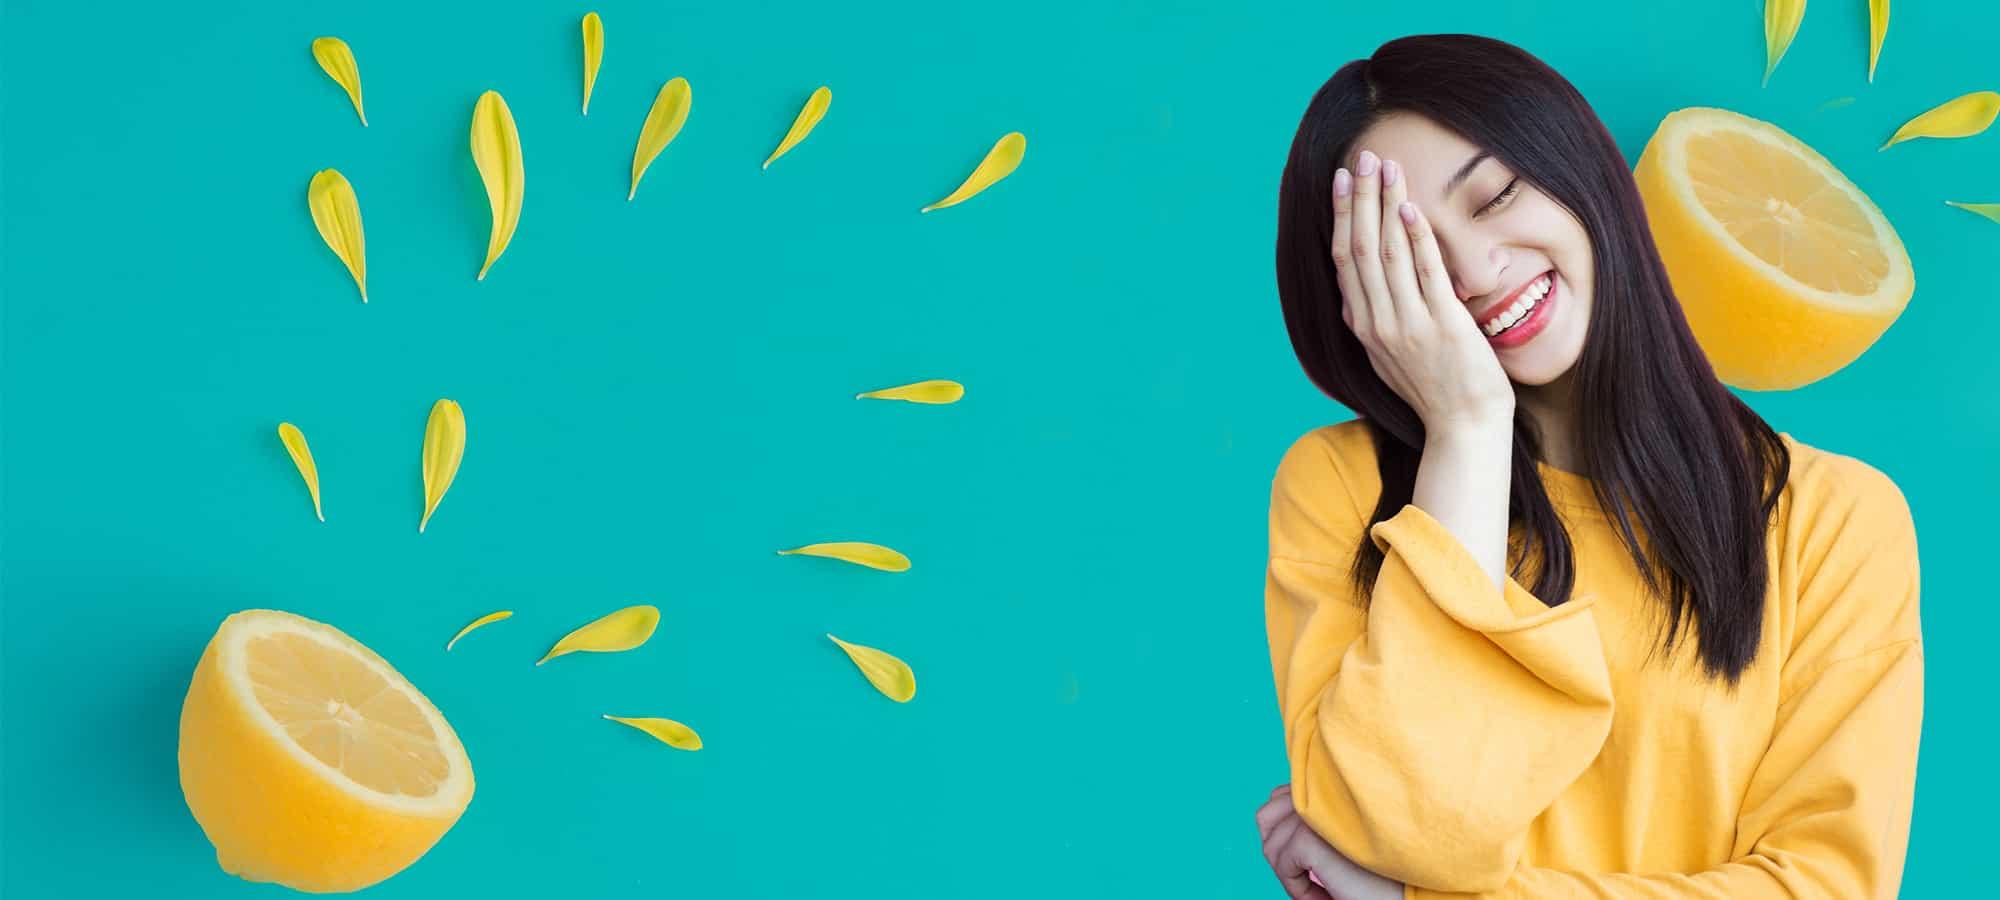 How to Turn Parenting Lemons into Lemonade